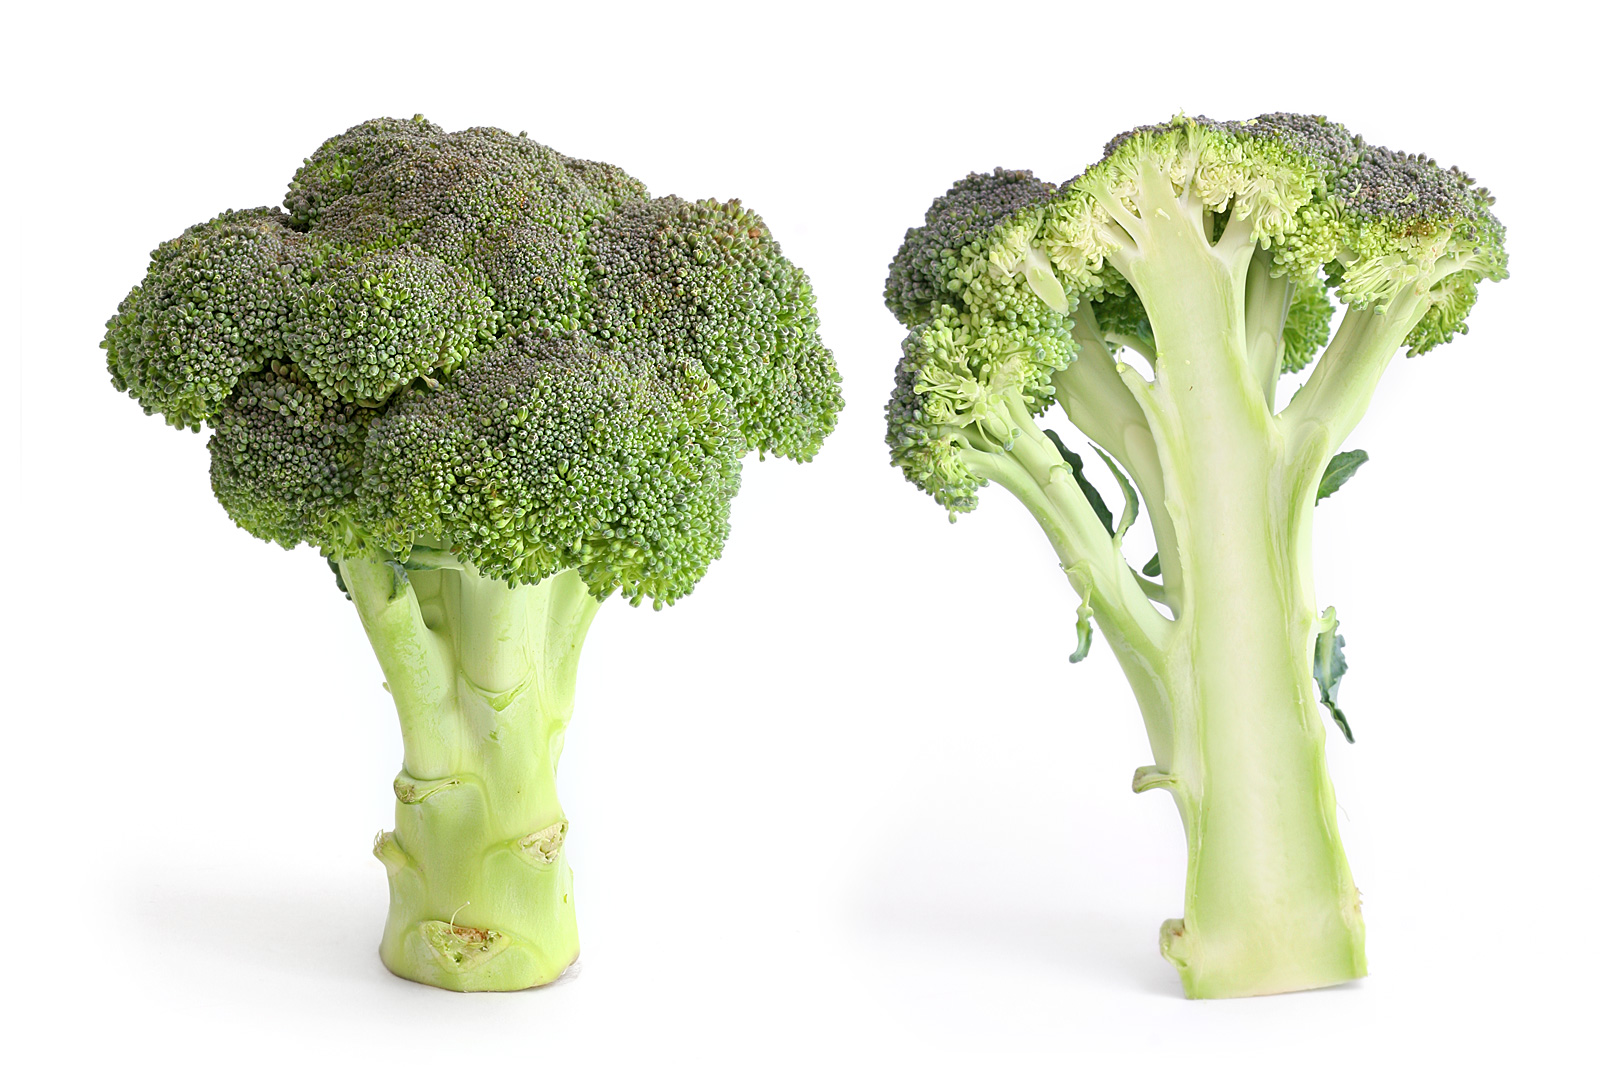 Brokoli Vikipedi